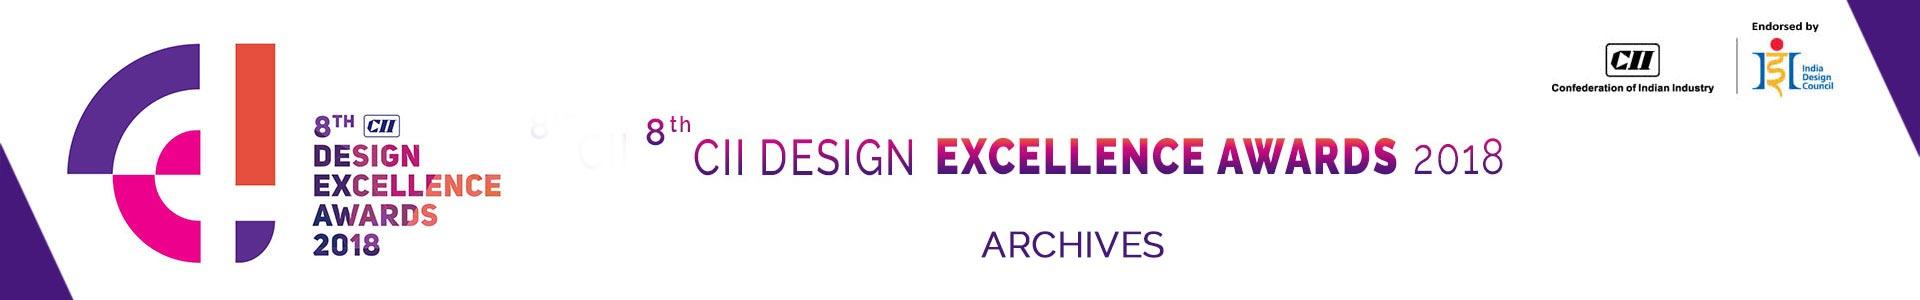 18th-cii-design-excellence-awards